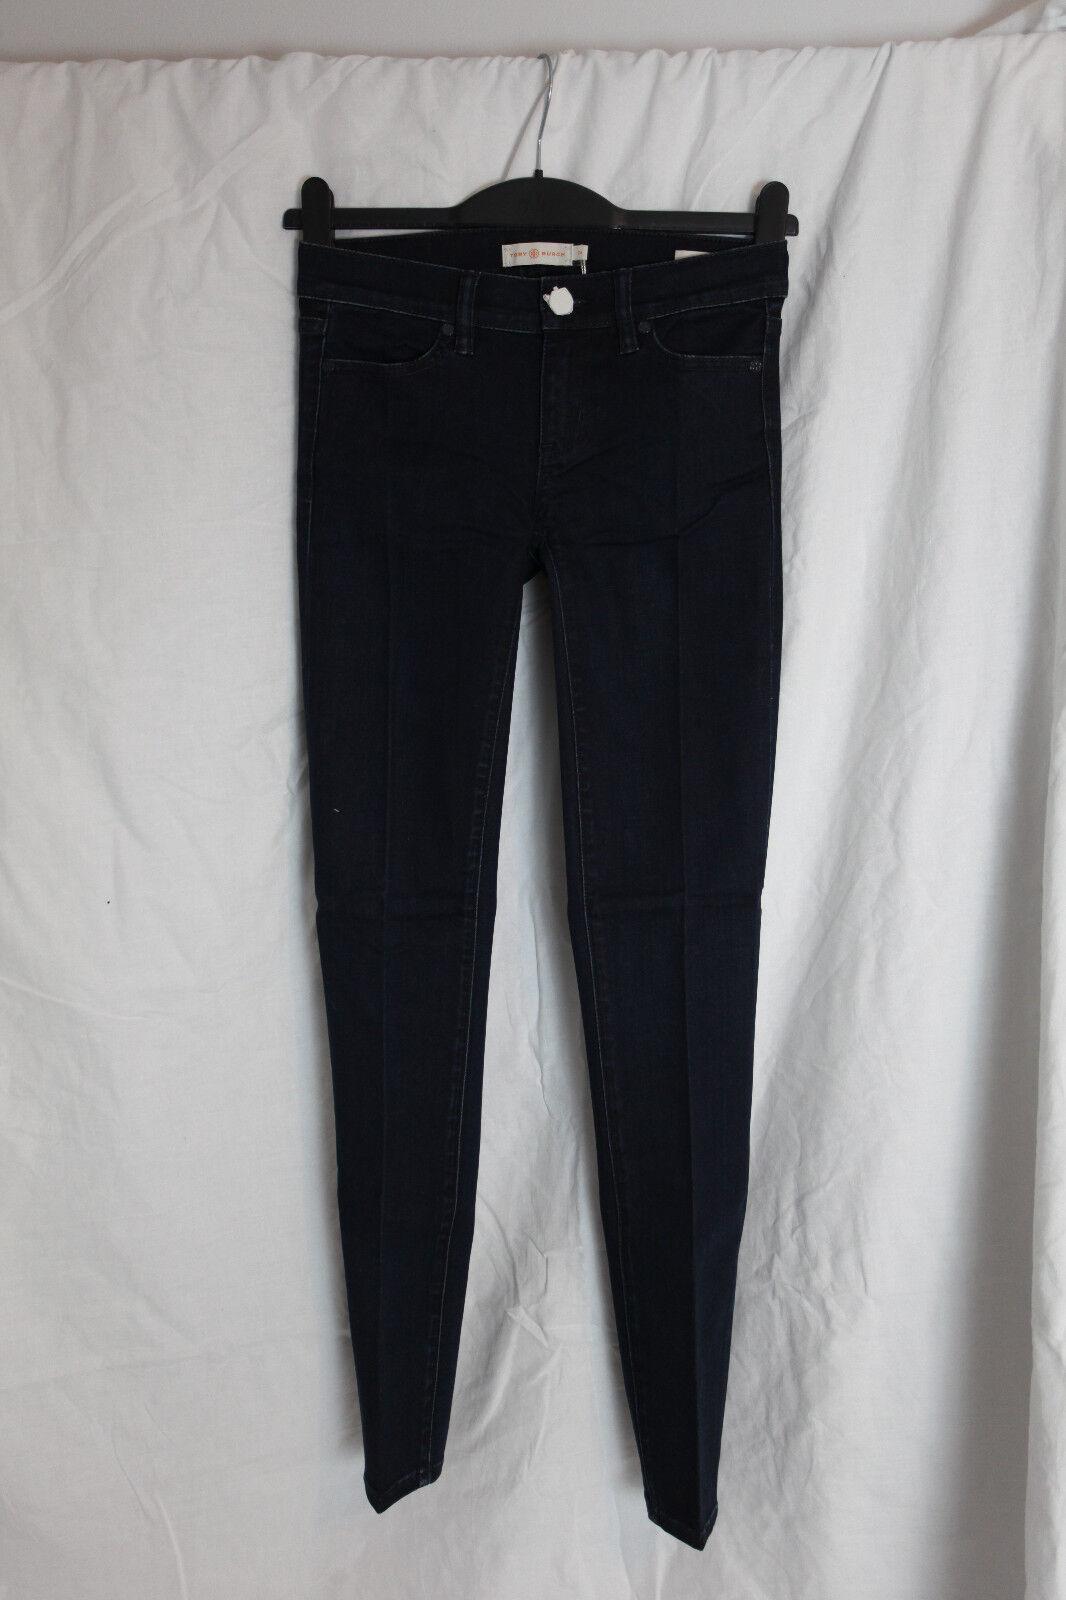 NWOT Tory Burch Legging Jean In Rinse Size 24